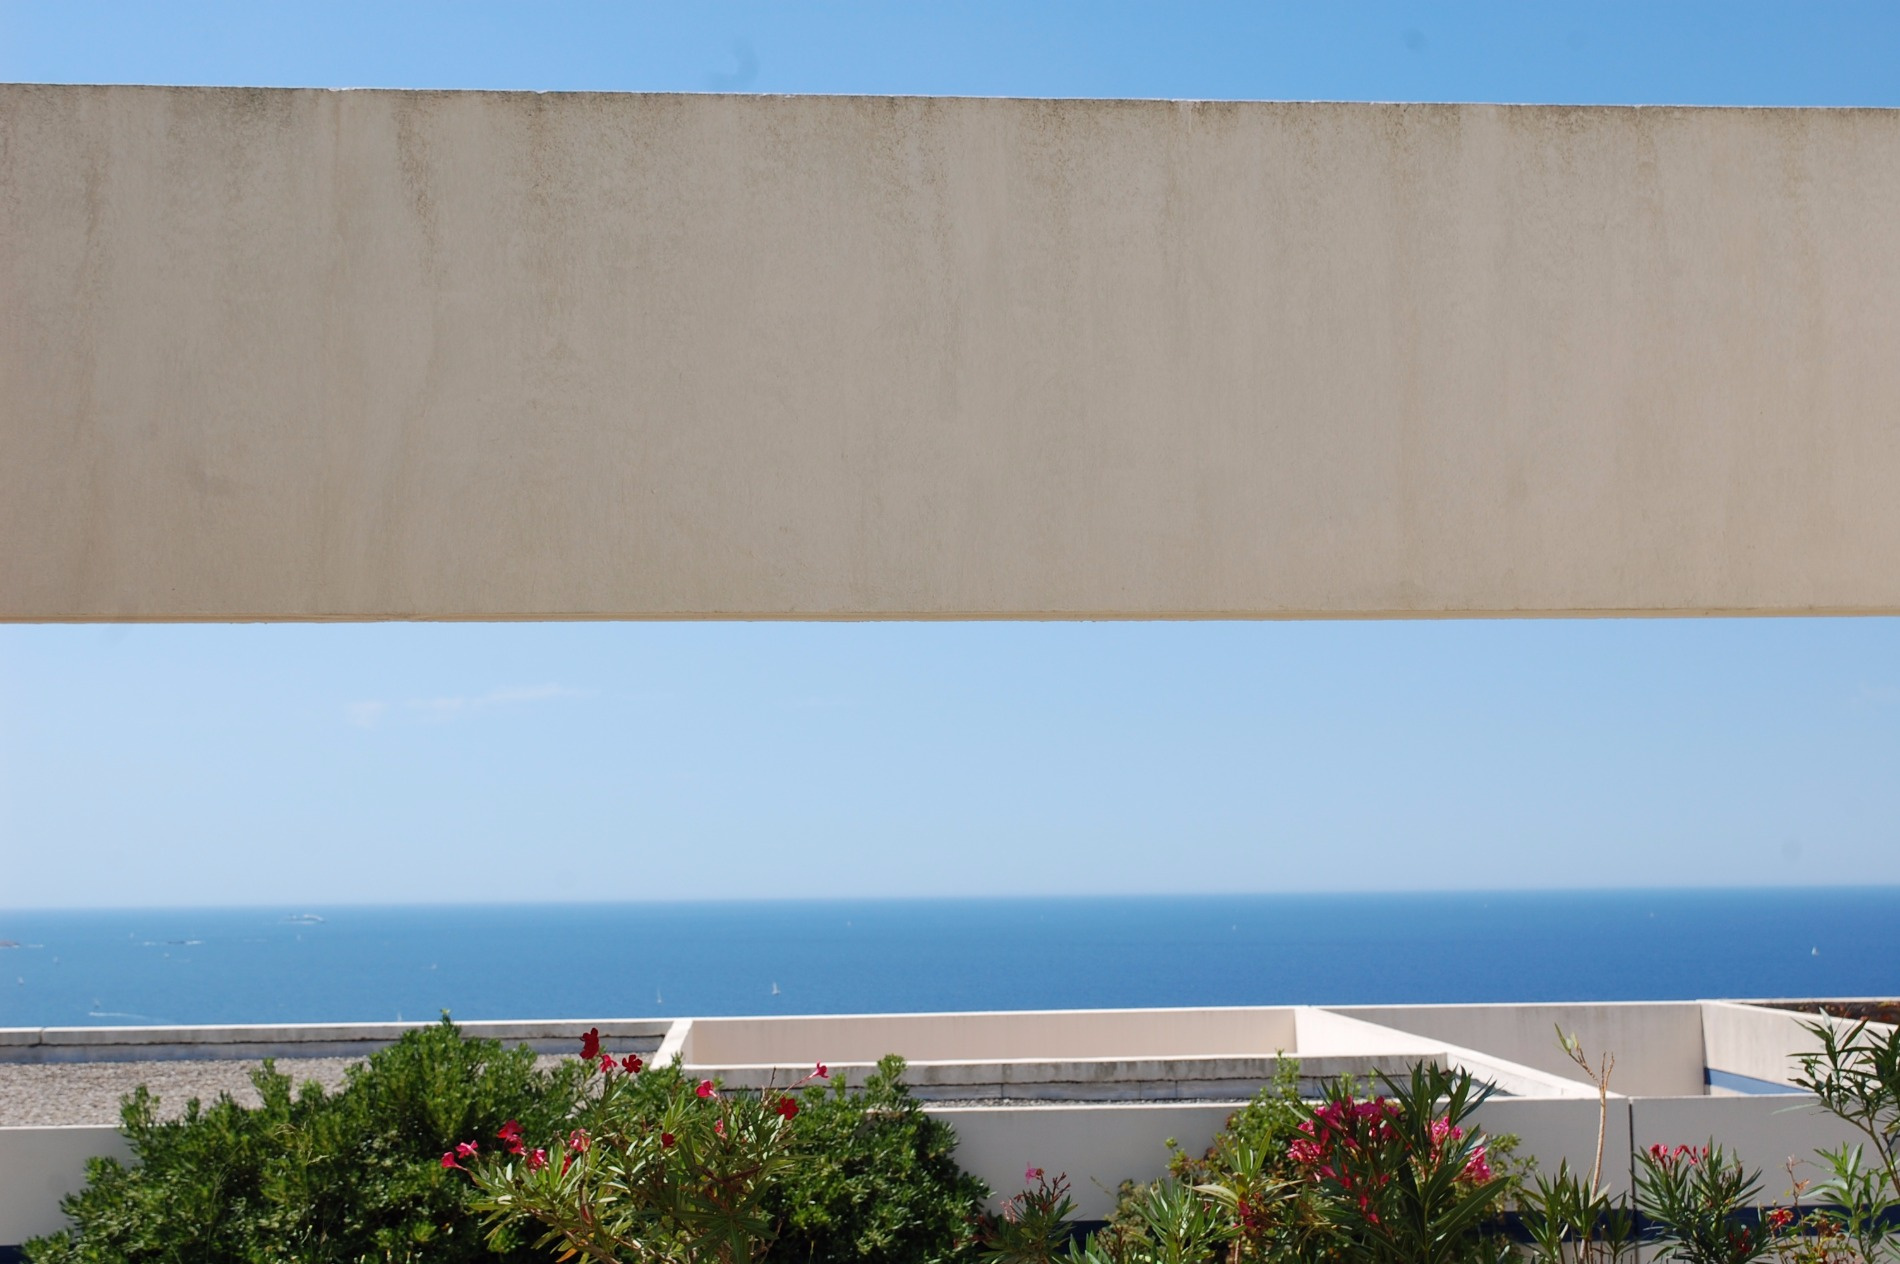 vente appartement type 2 vue mer panoramique. Black Bedroom Furniture Sets. Home Design Ideas